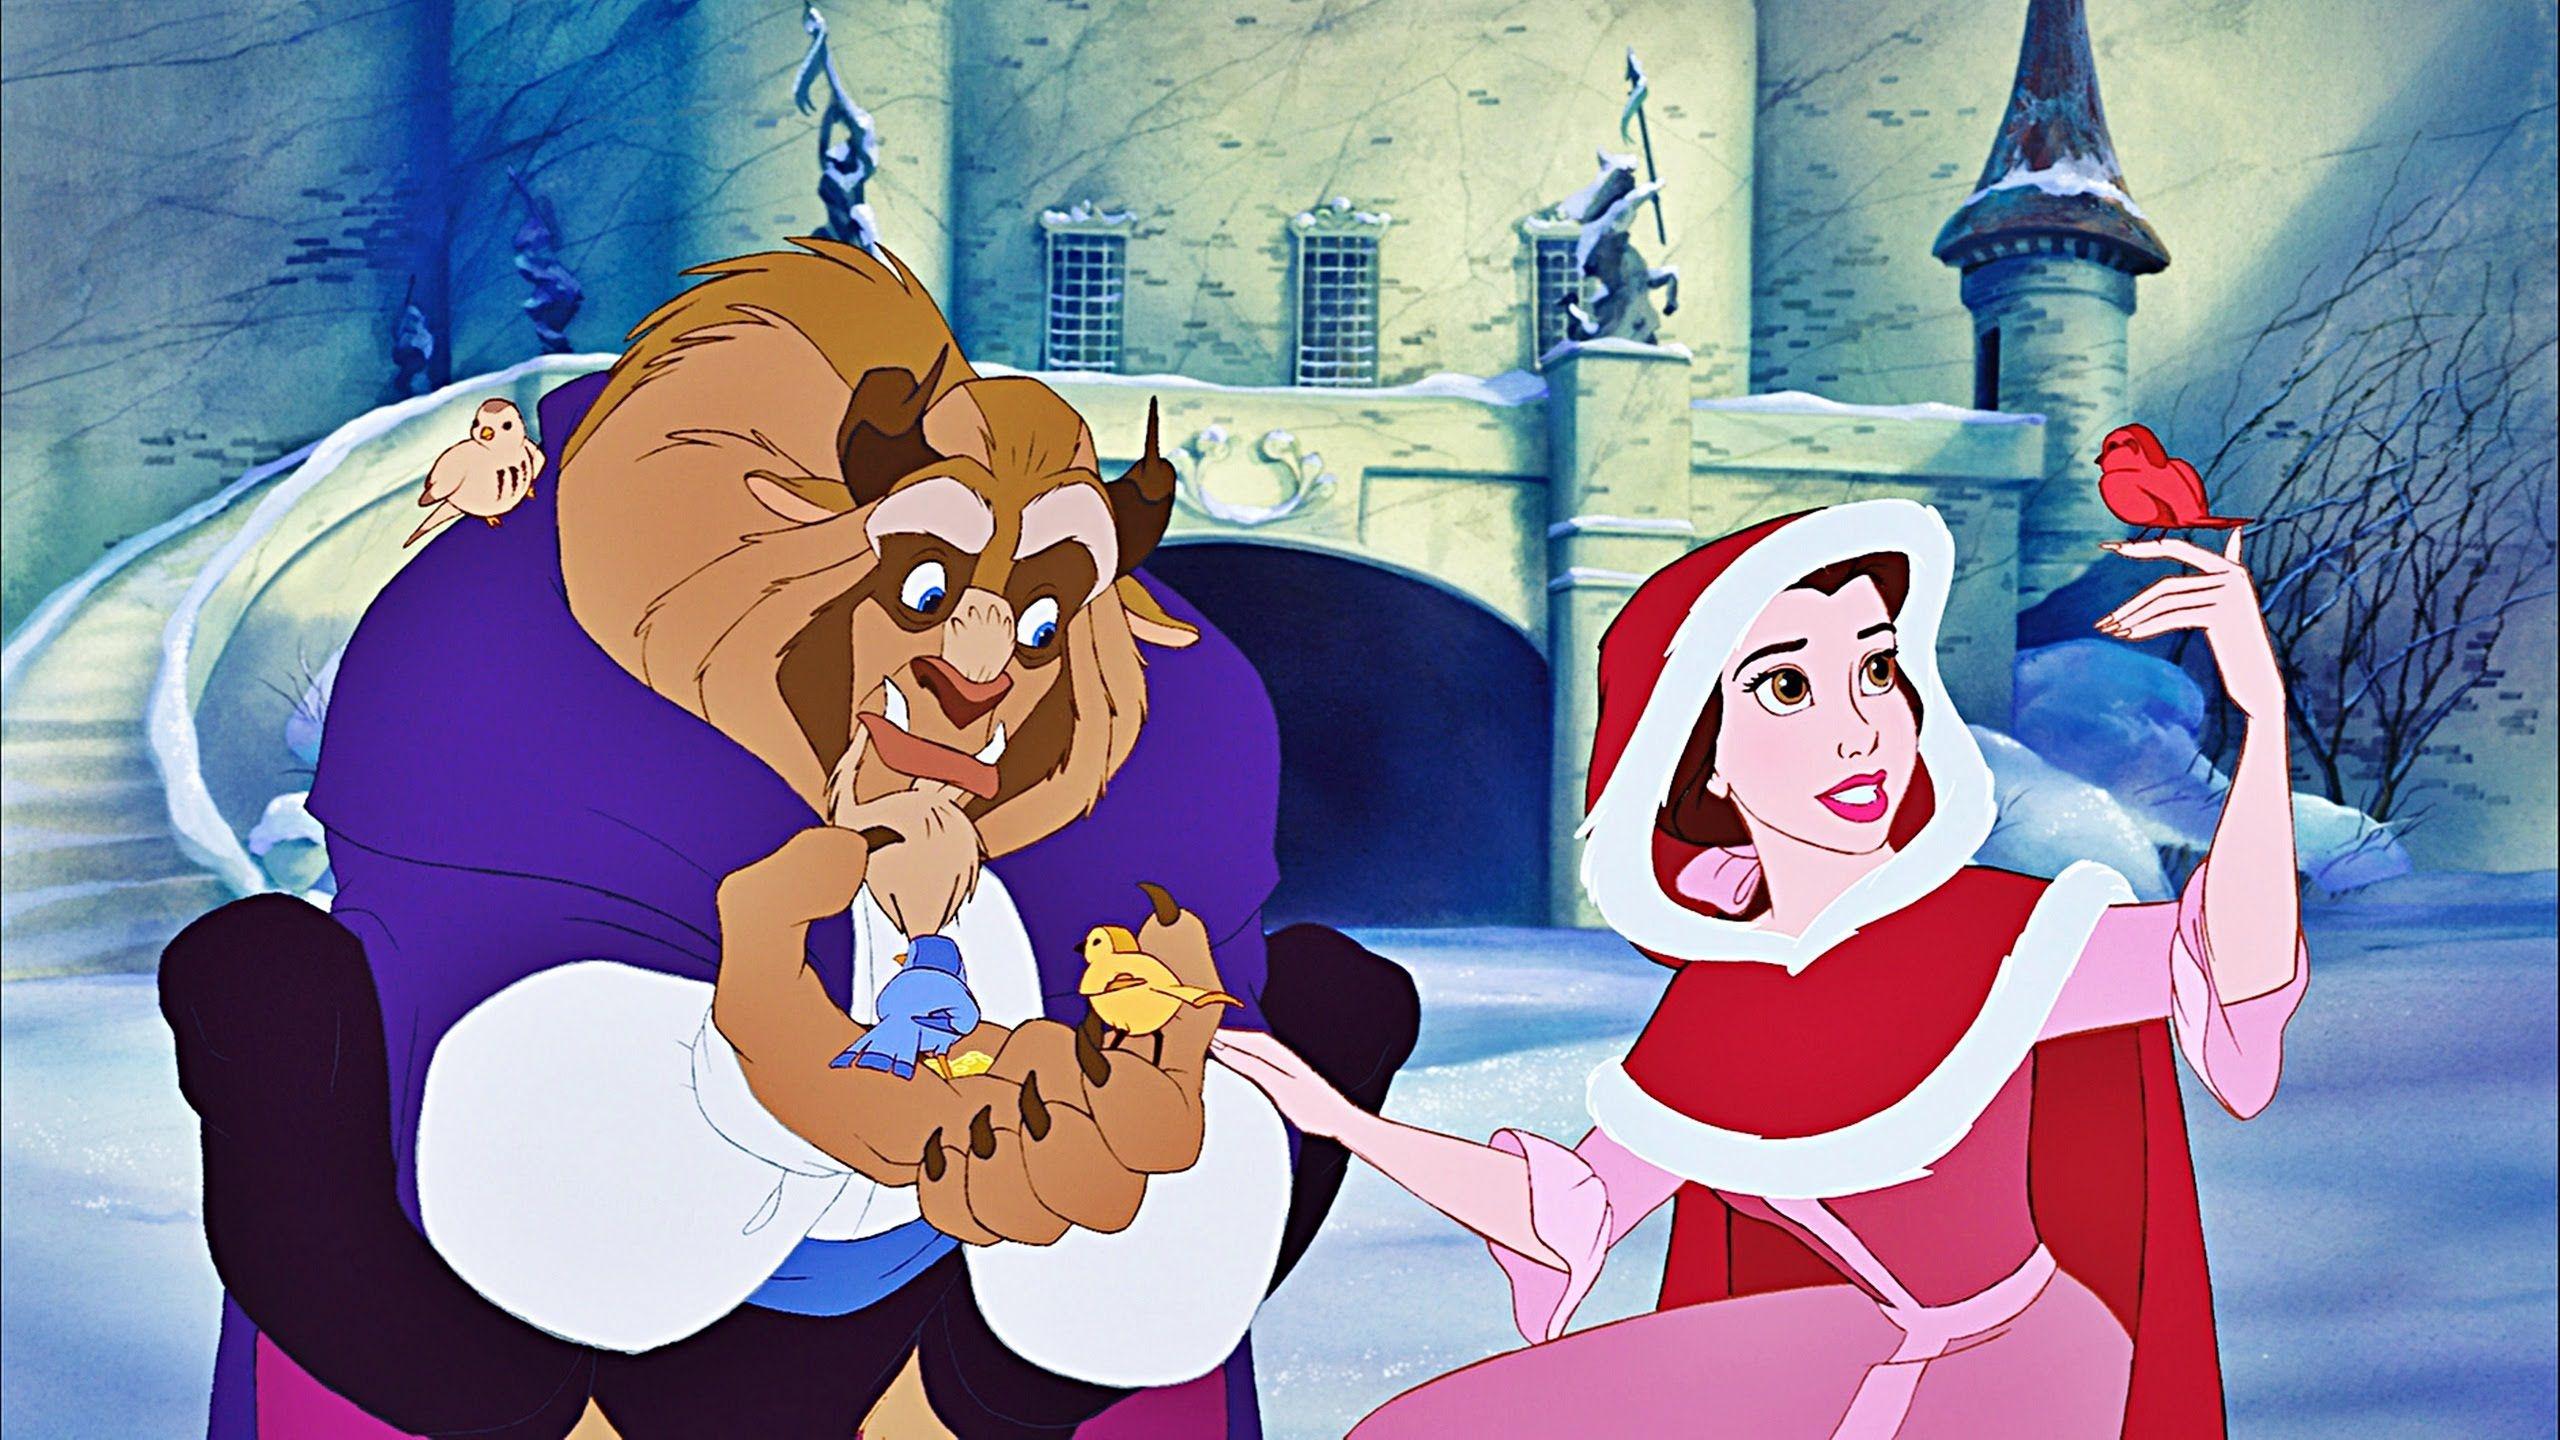 Animation movie beauty and the beast full movie cartoon for